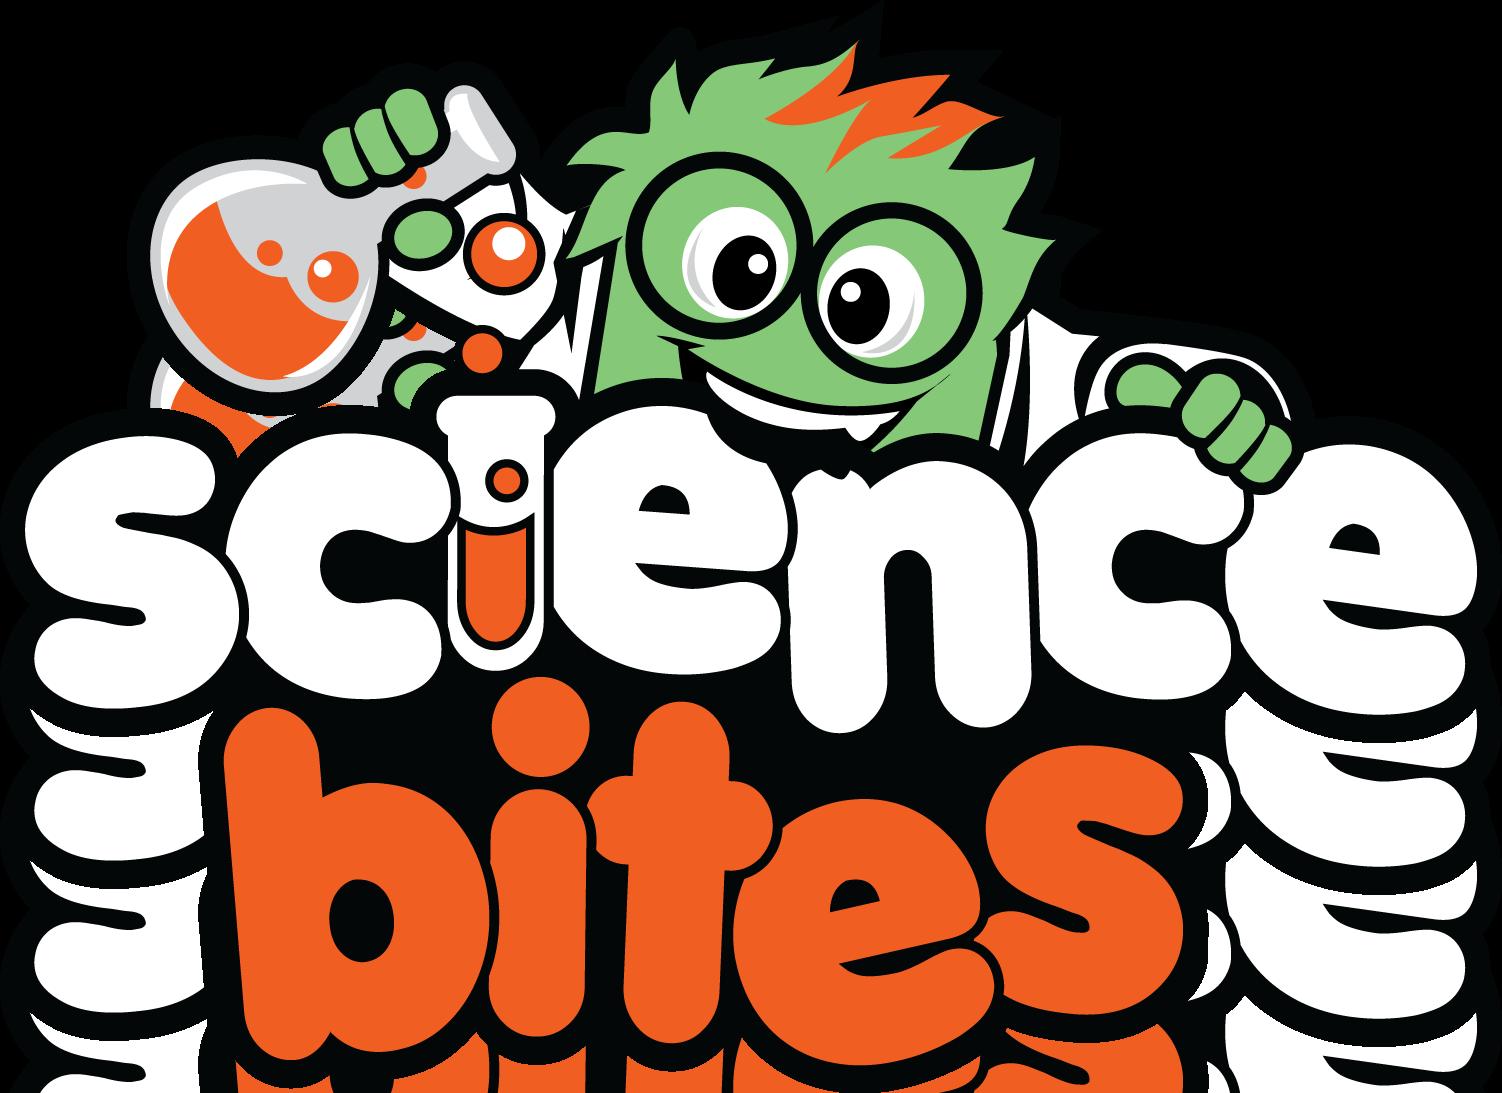 Exhibition png transparent images. Logo clipart science